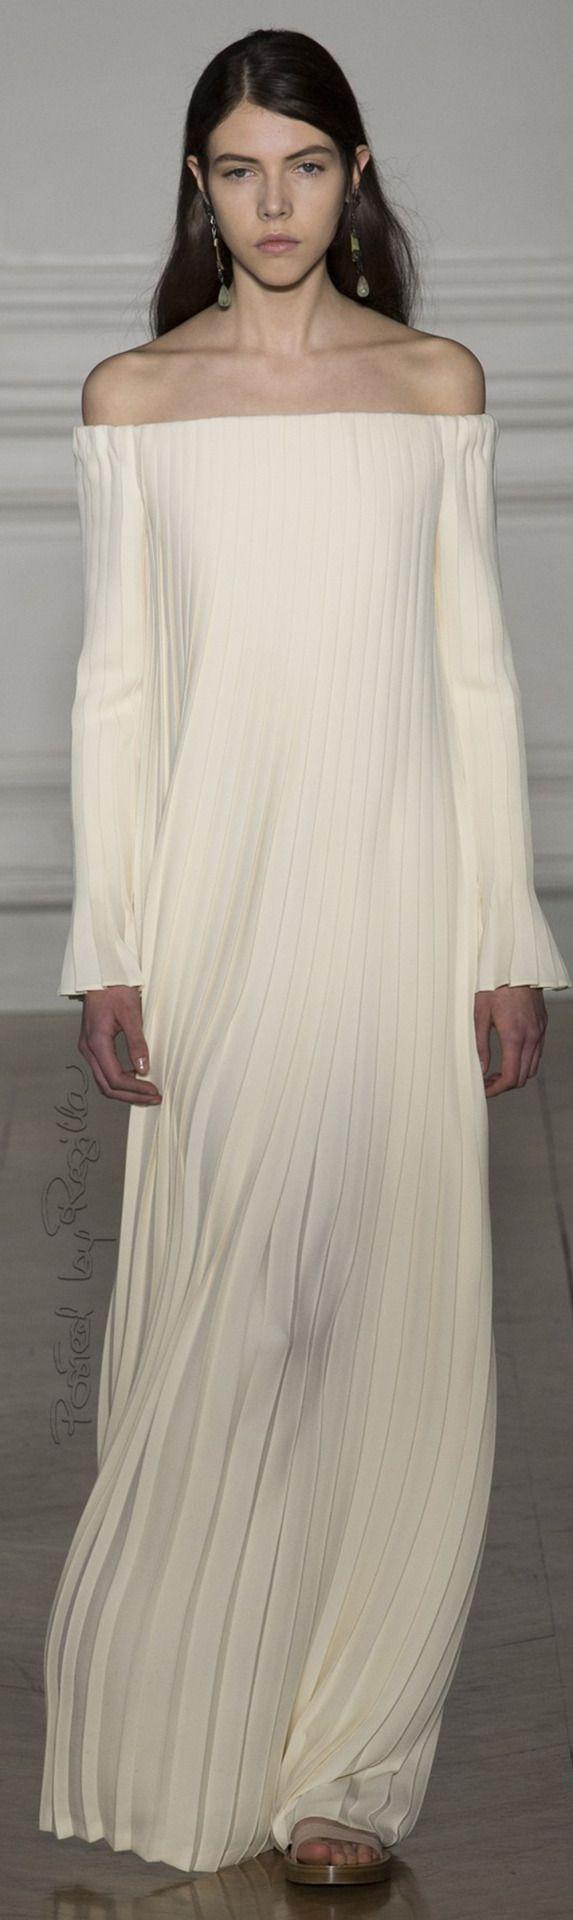 Regilla ⚜ Valentino Couture Spring-Summer 2017